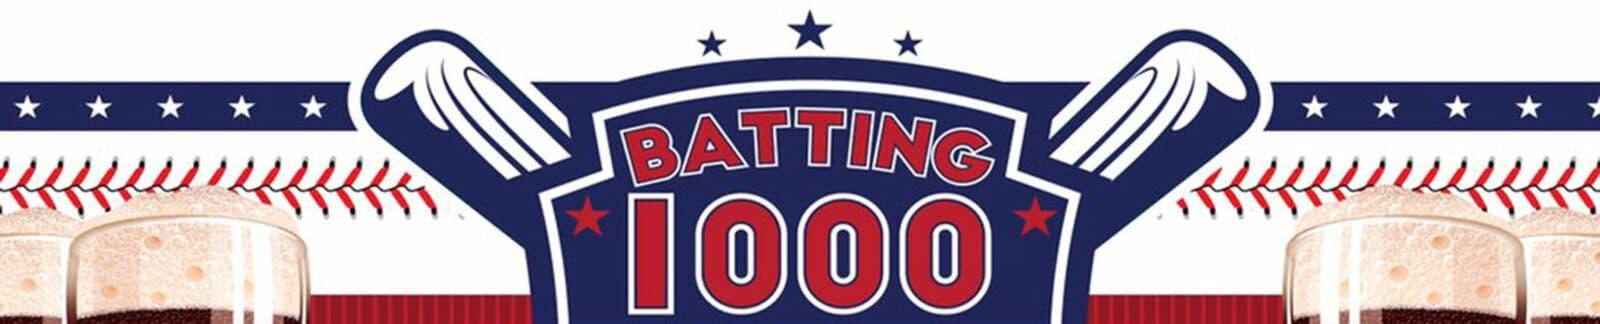 Batting 1000 Red Lager header